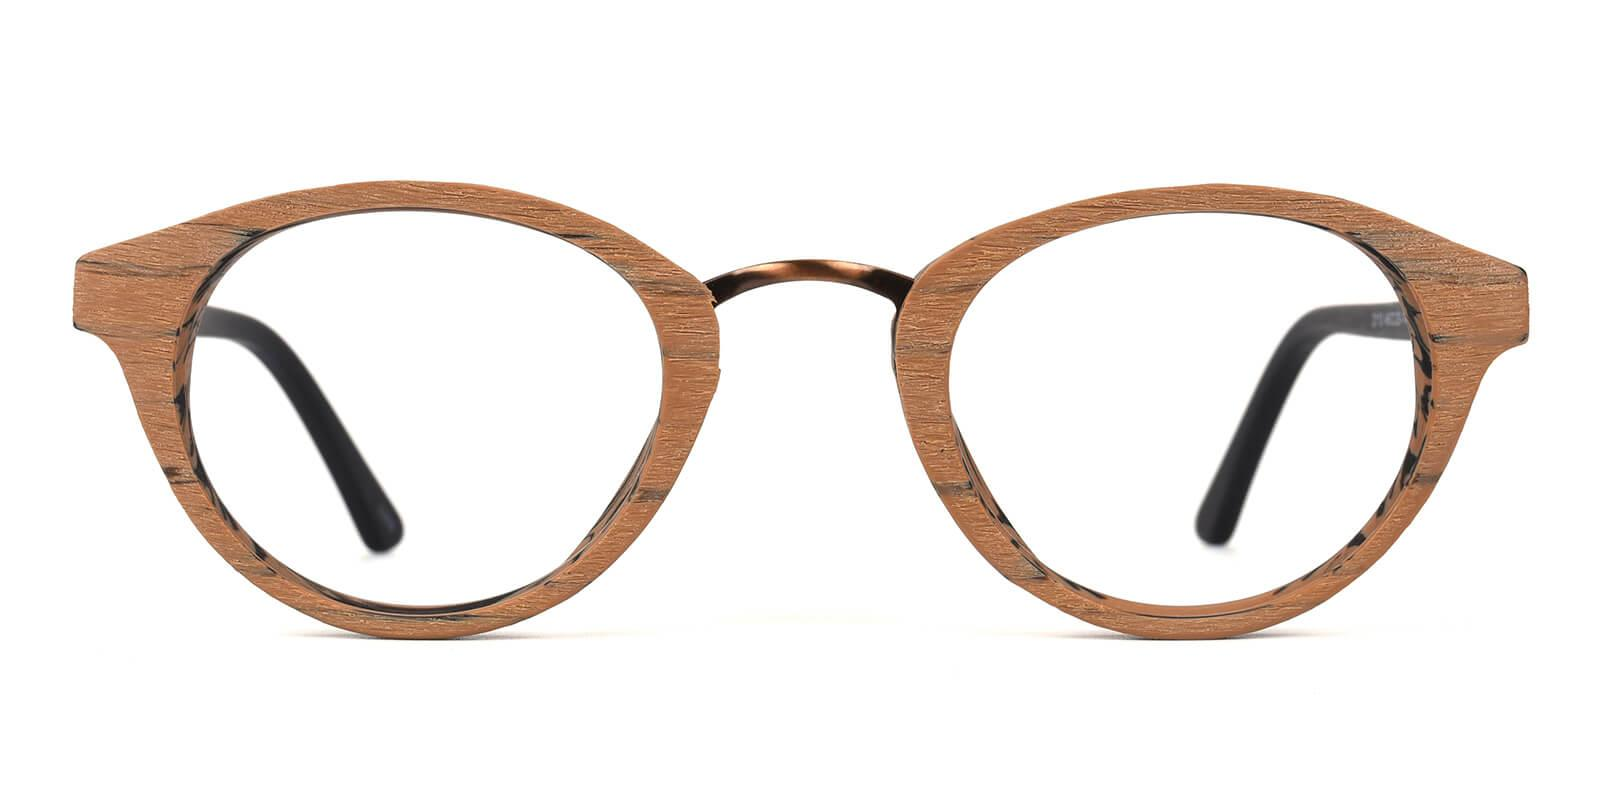 Haiden-Cream-Oval-Acetate-Eyeglasses-additional2